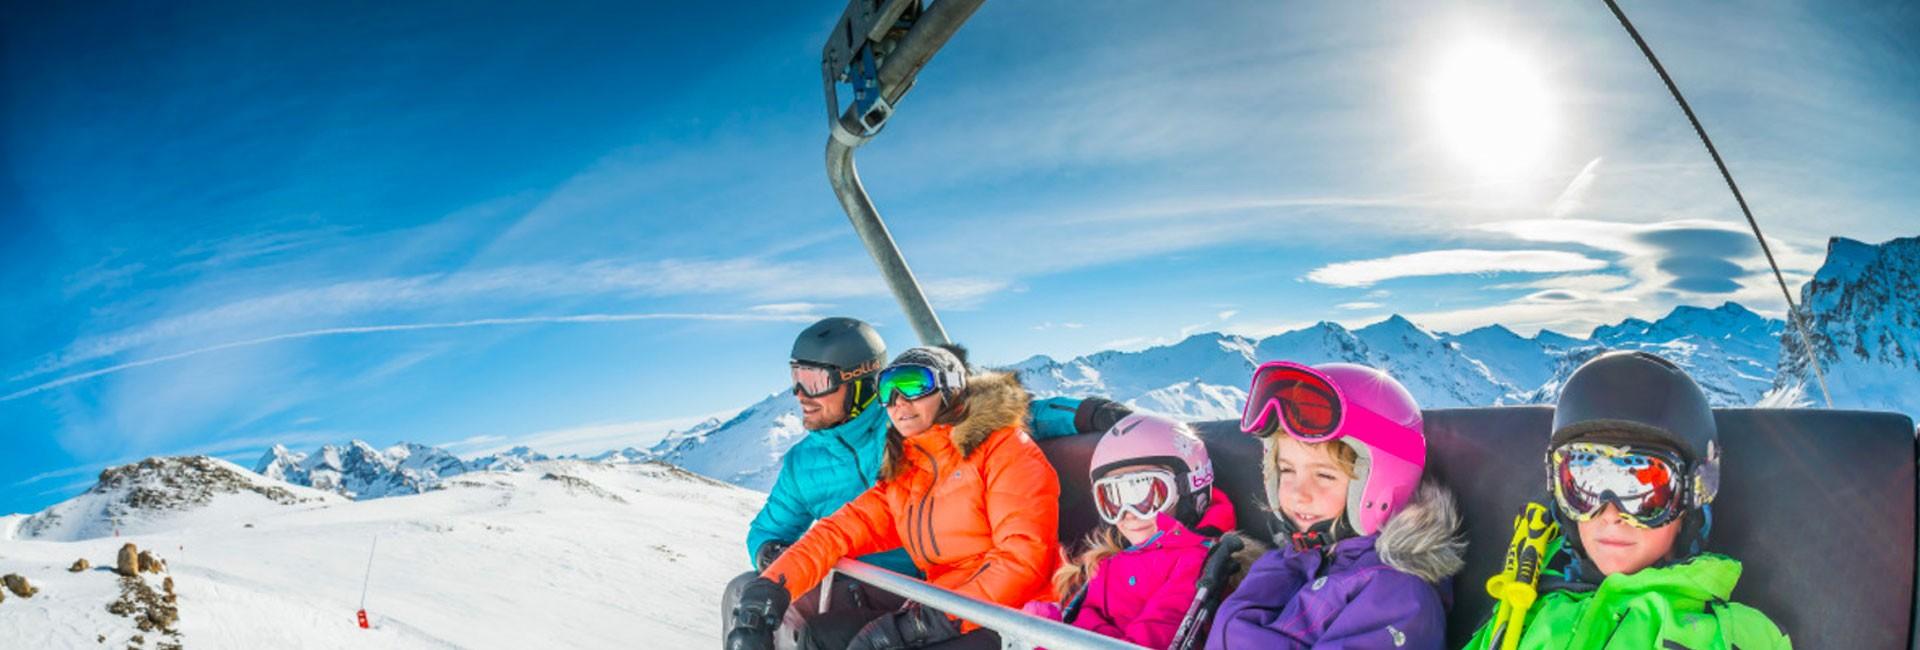 famille-sejour-ski-val-d-isere-37